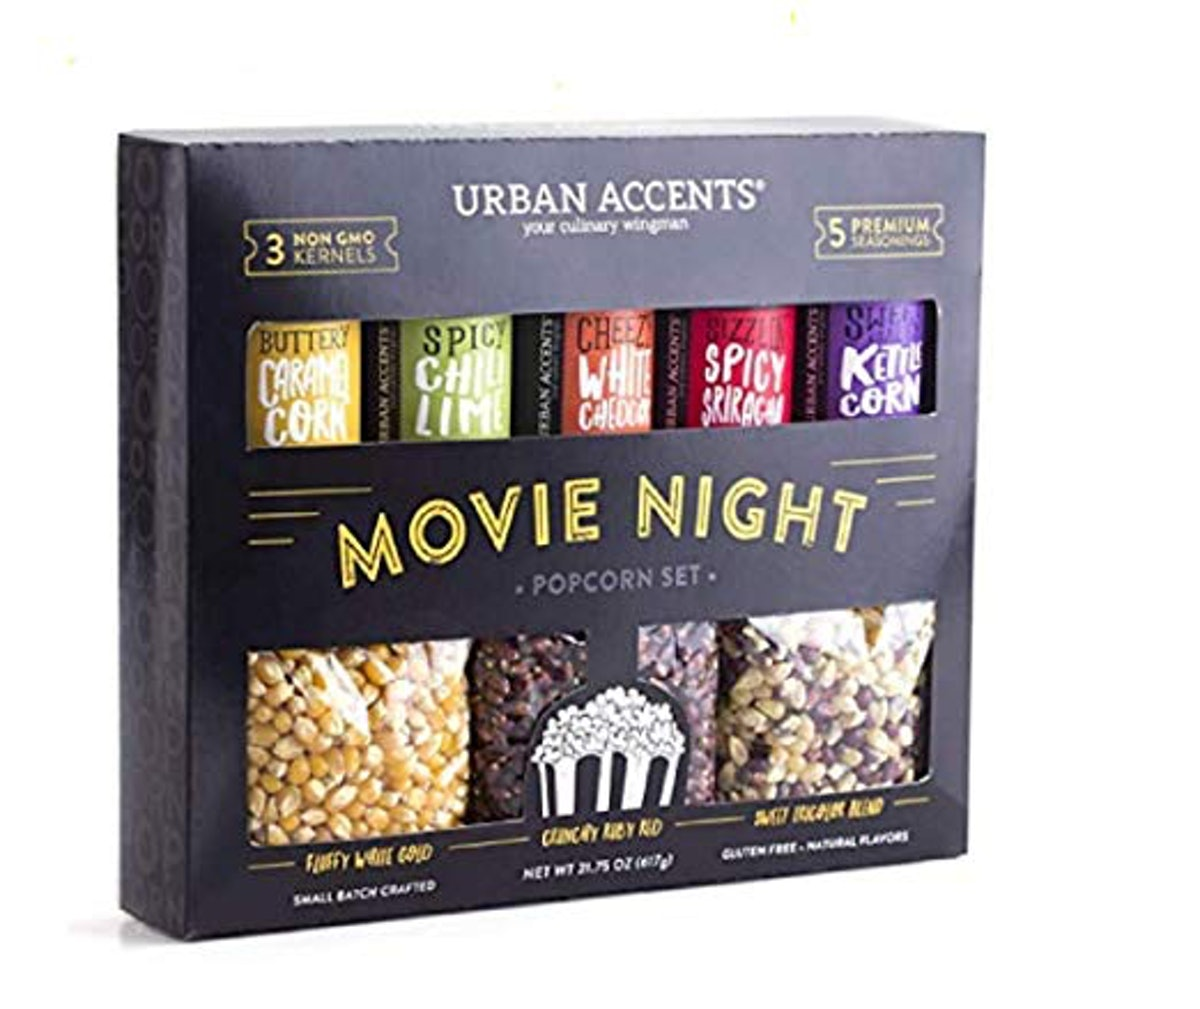 Urban Accents MOVIE NIGHT Popcorn Kernels